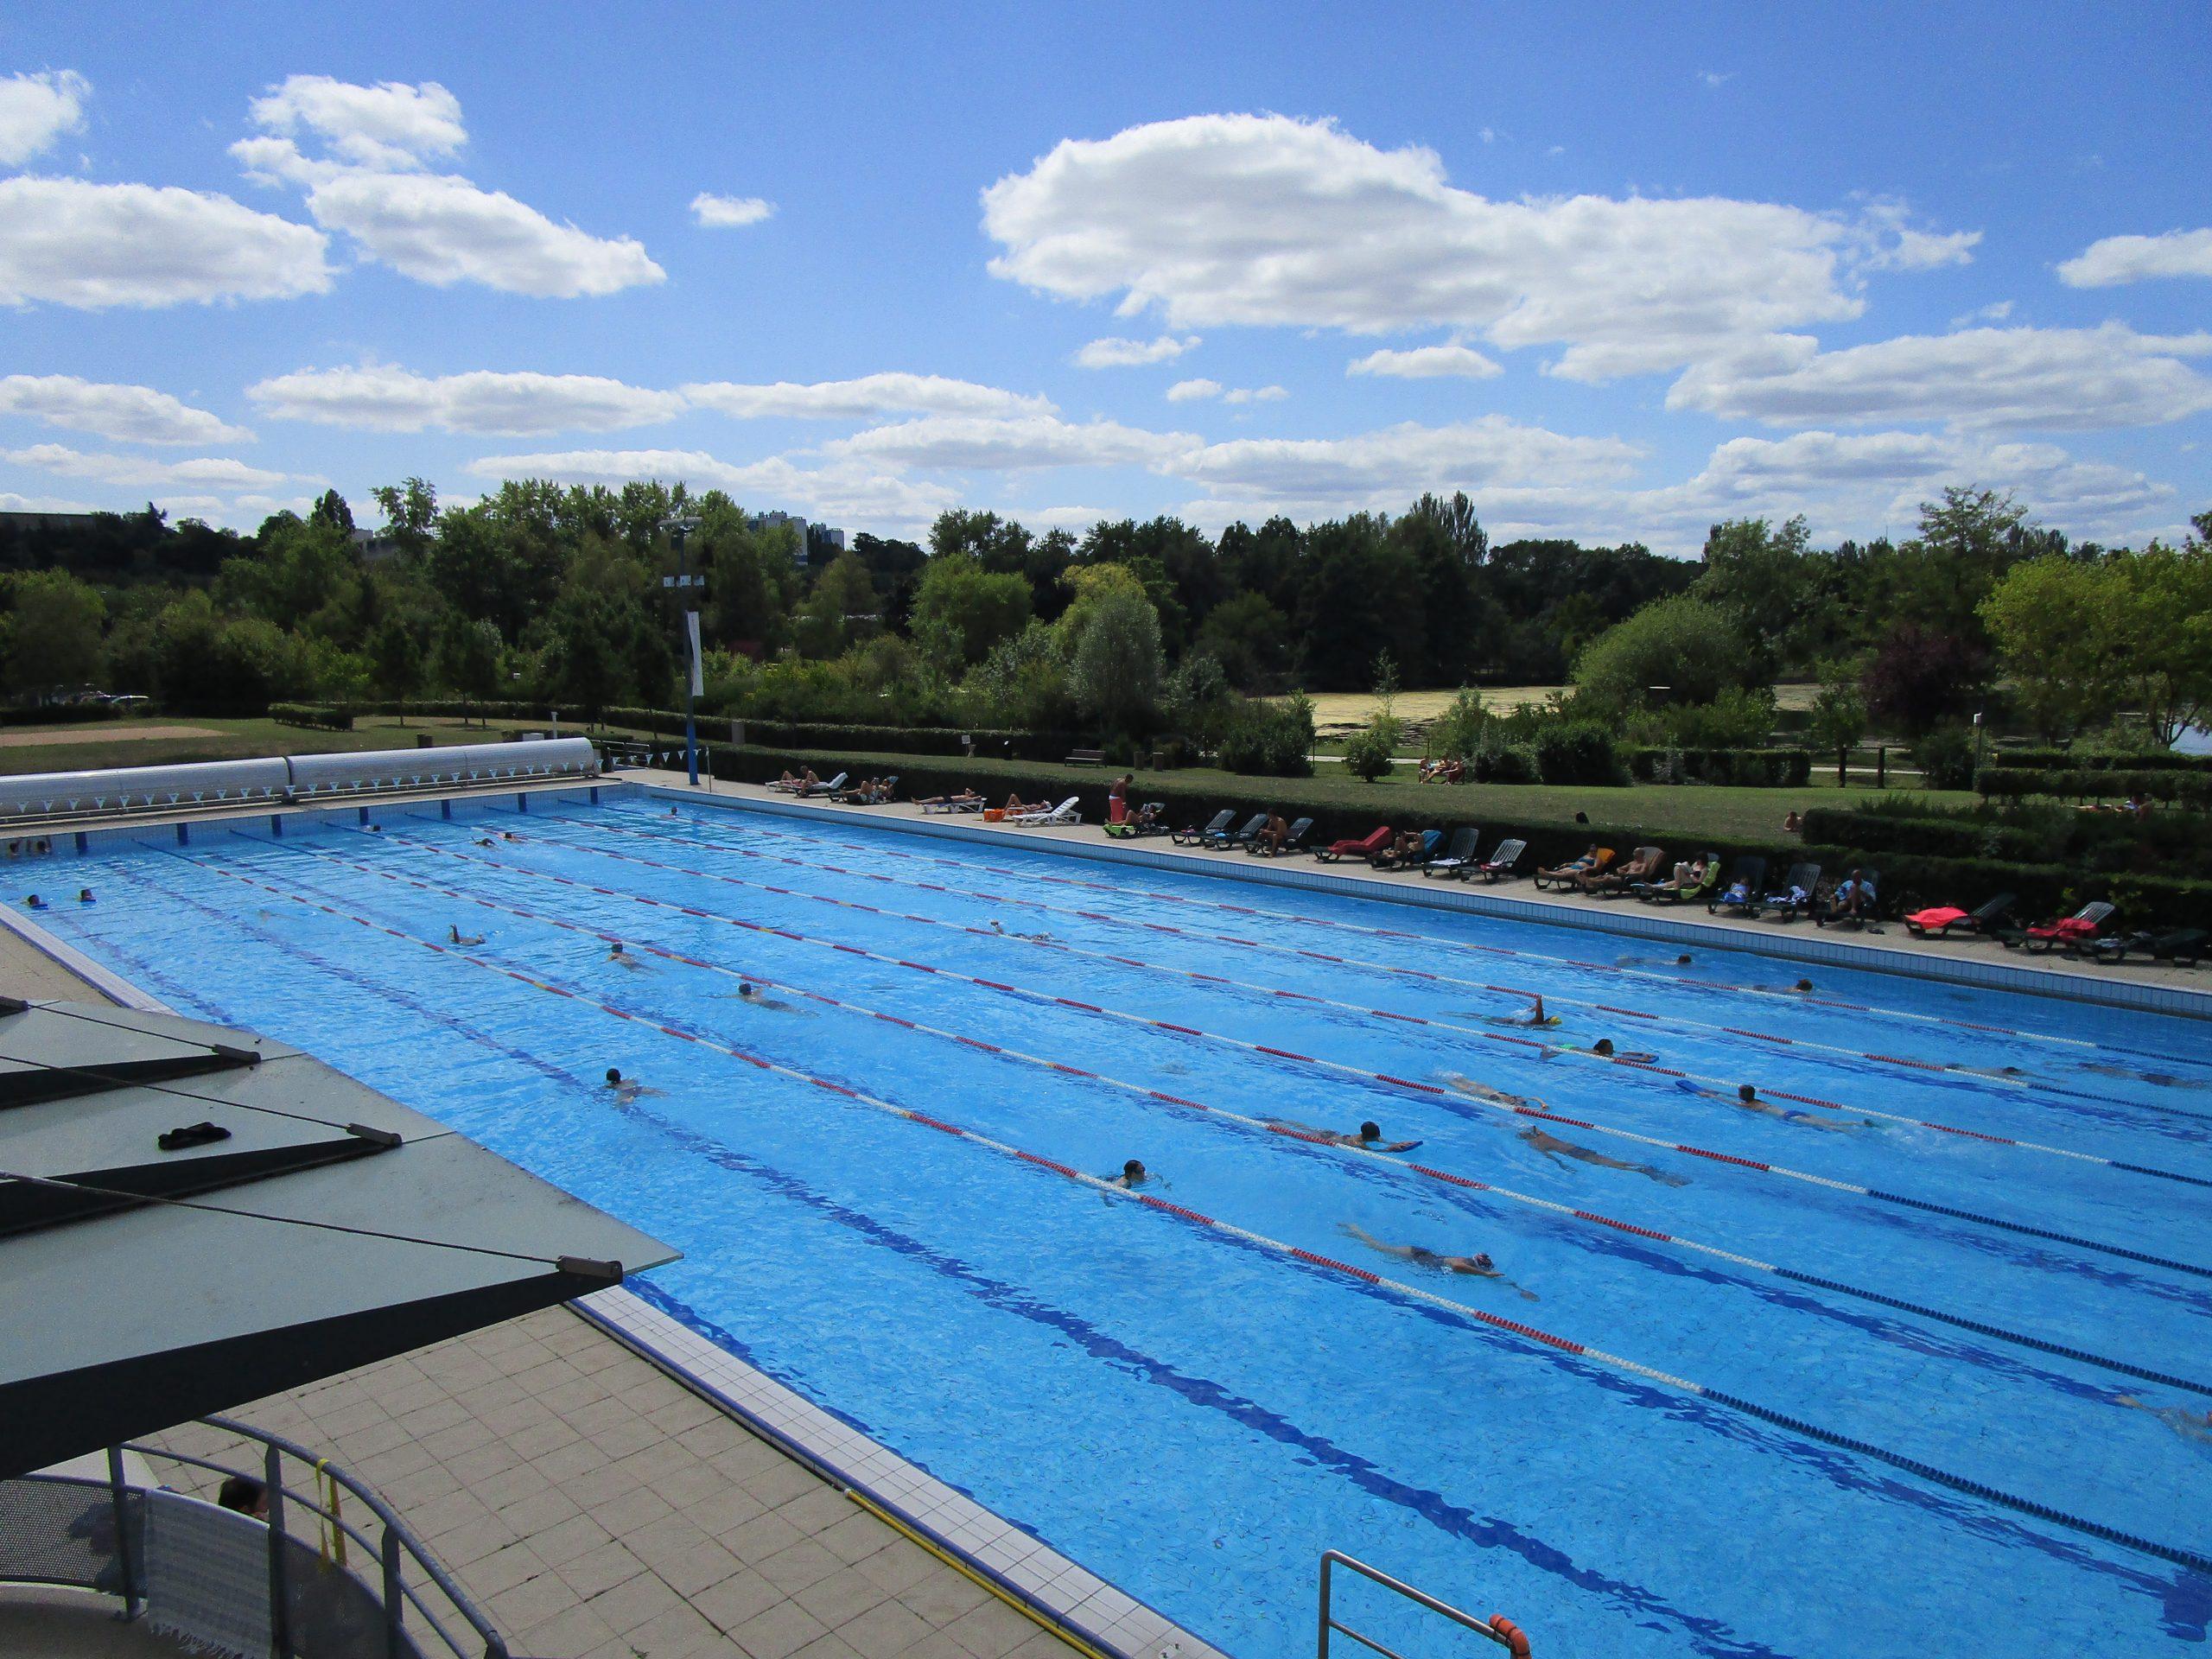 File:piscine Du Lac Tours.jpg - Wikimedia Commons intérieur Piscine Du Lac Tours